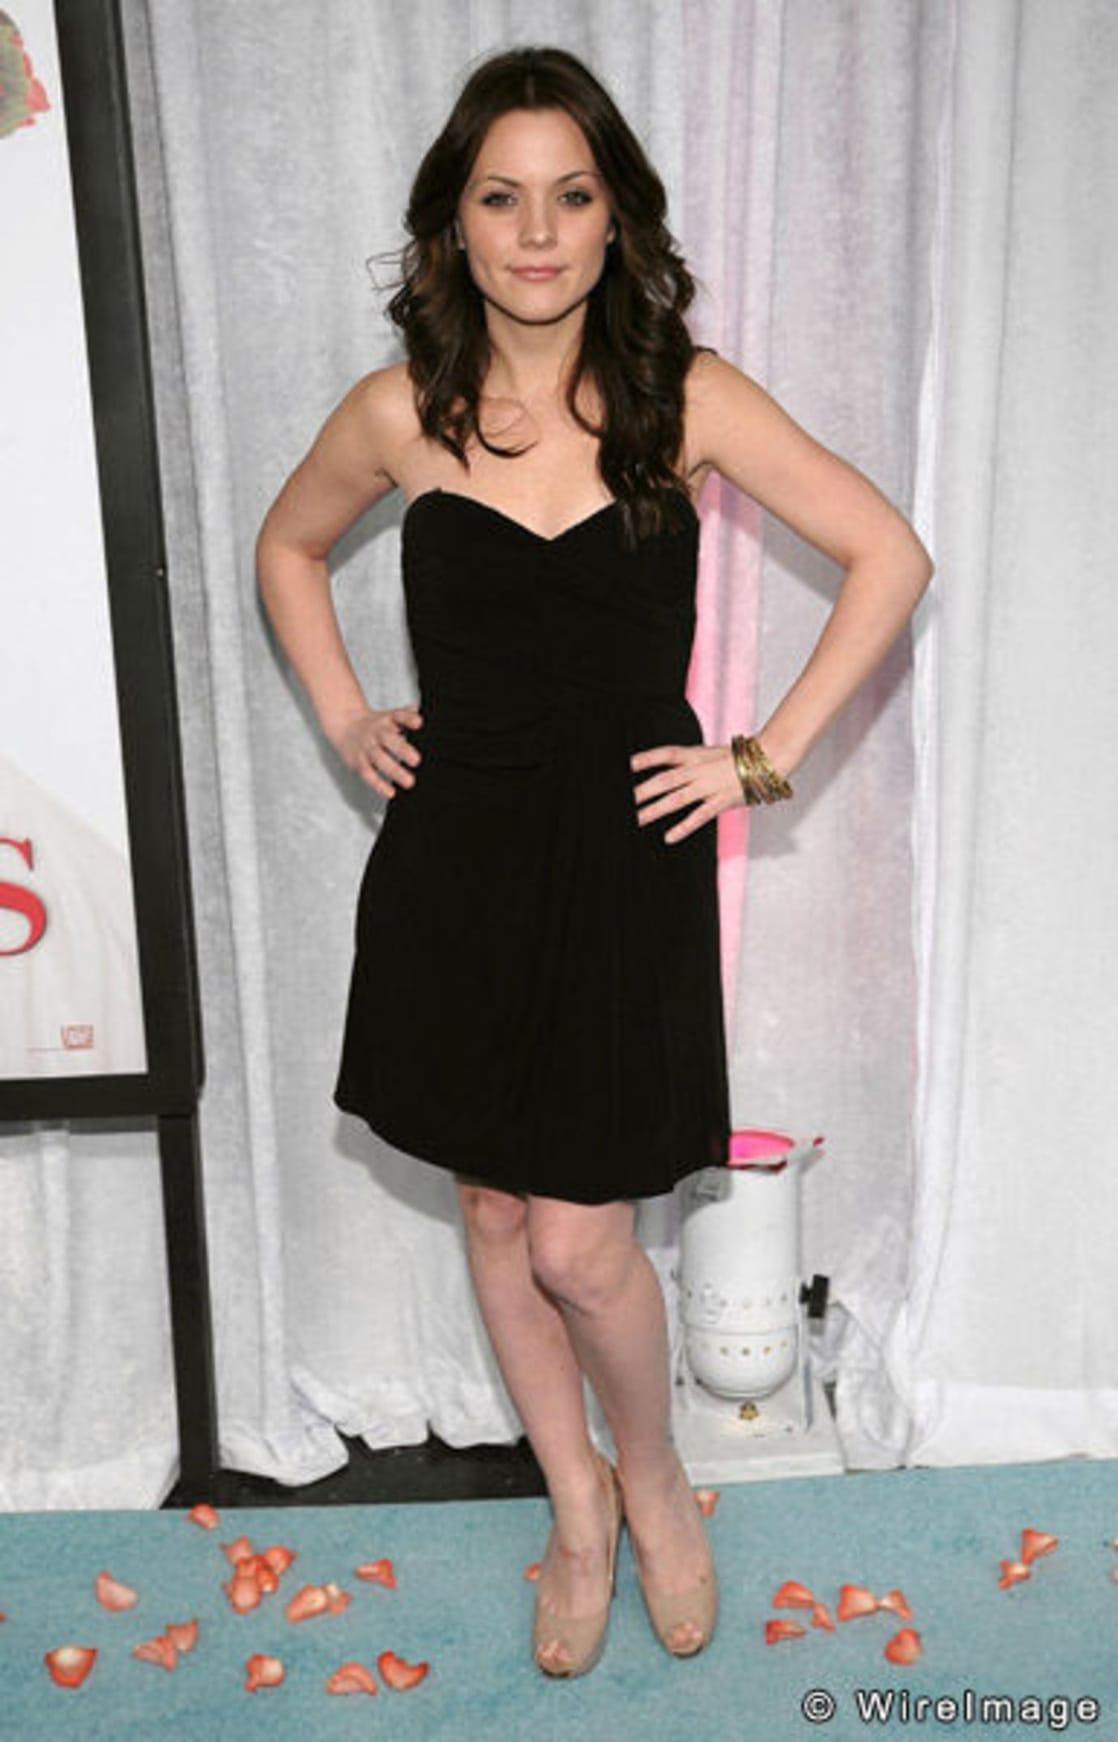 Rachel Nichols born January 8, 1980 (age 38),Denise Richards Hot video Lillian Logan,Stephanie McKay